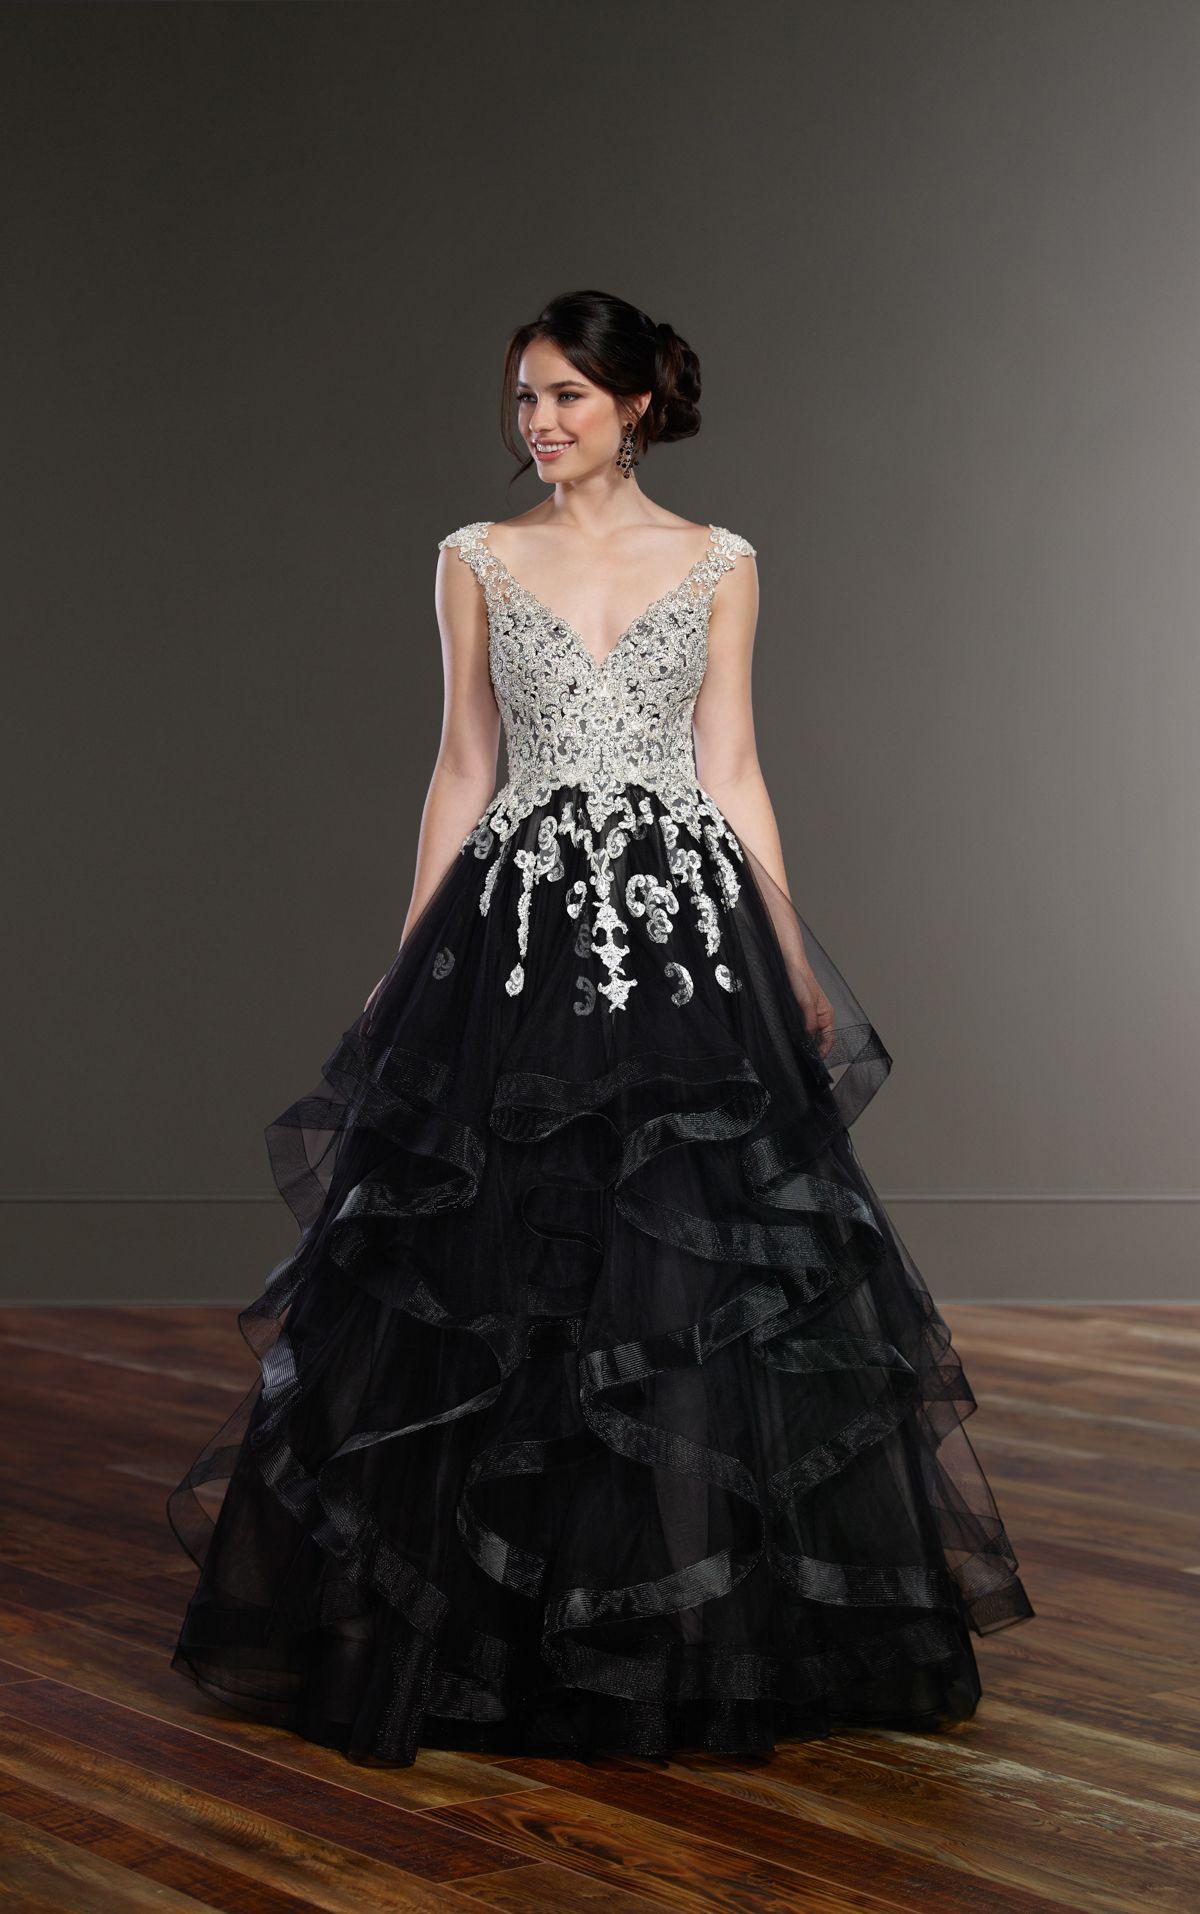 37+ Wedding dress sizes australia information